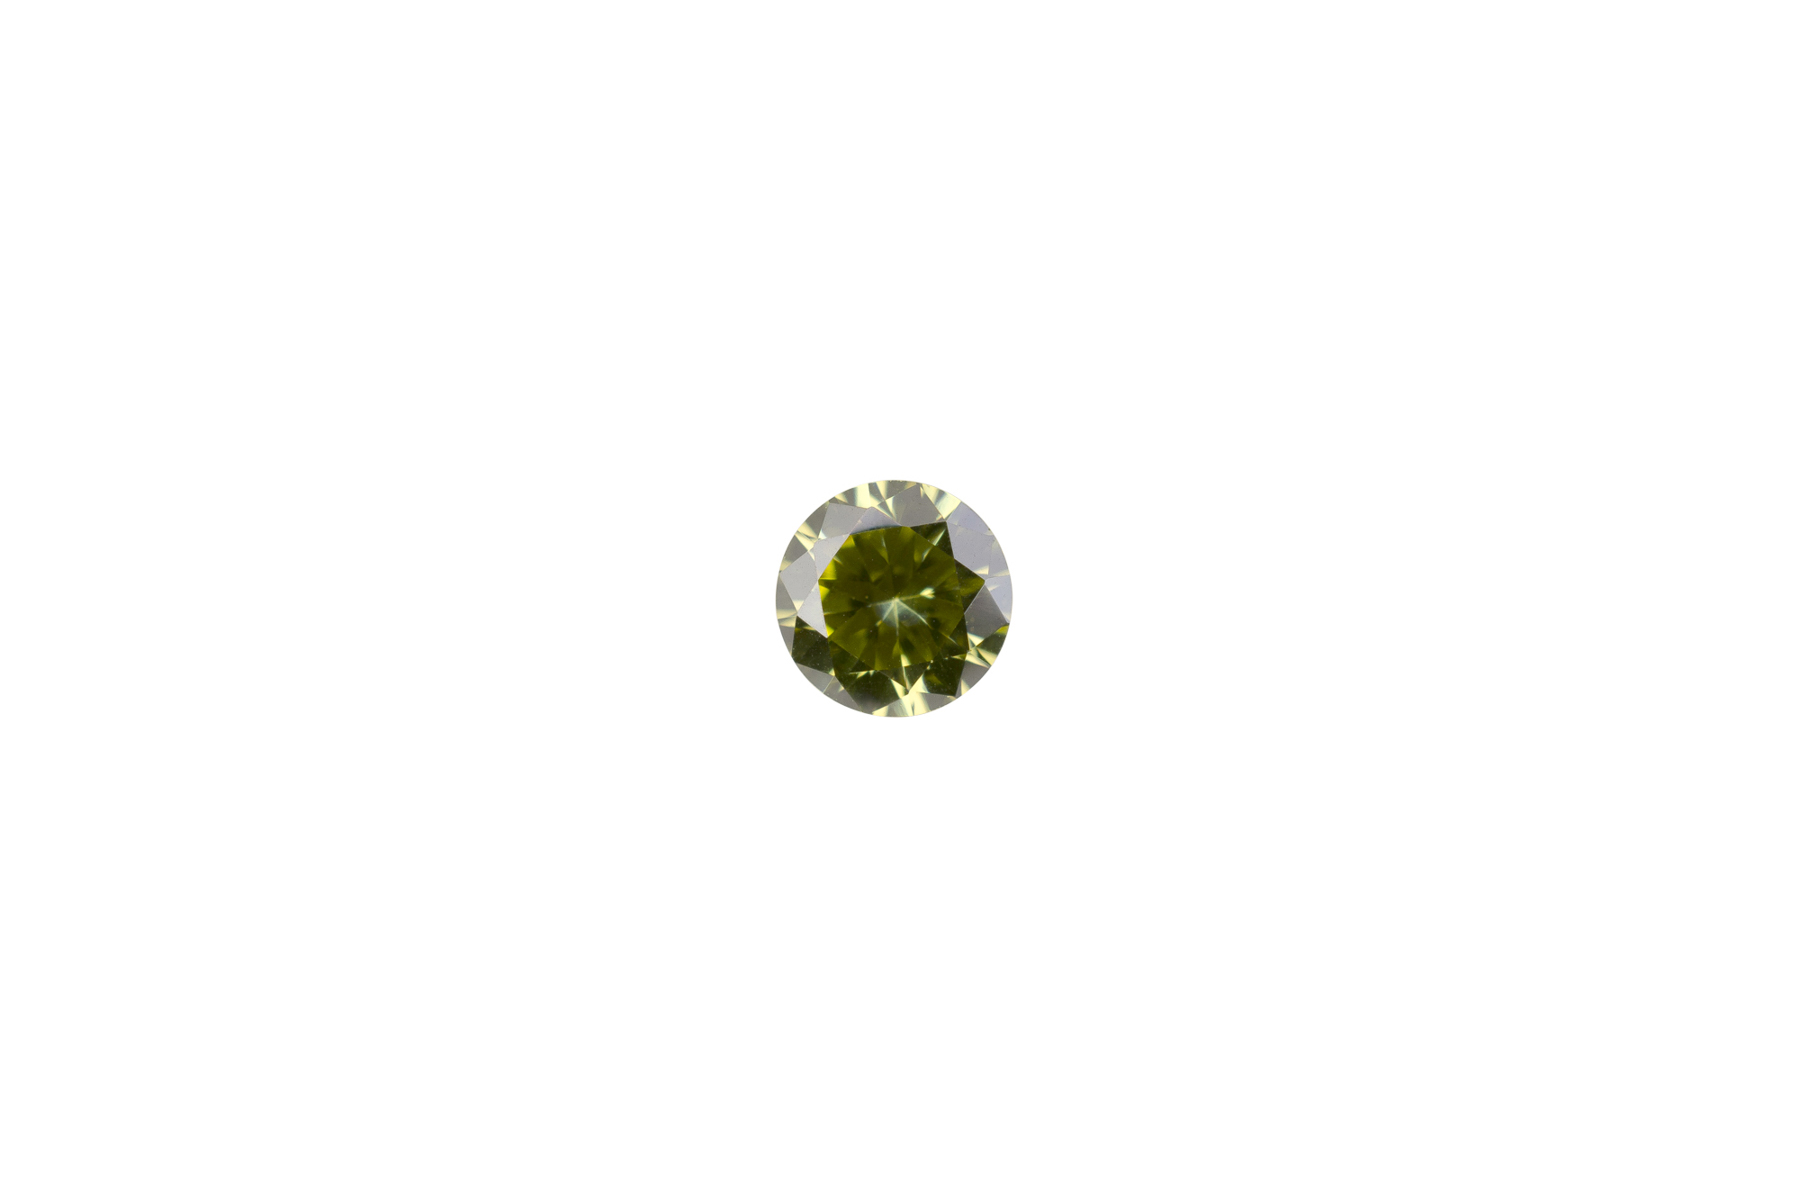 c35c6c1d8 3mm Round Faceted Peridot Color Cubic Zirconia - Santa Fe Jewelers ...